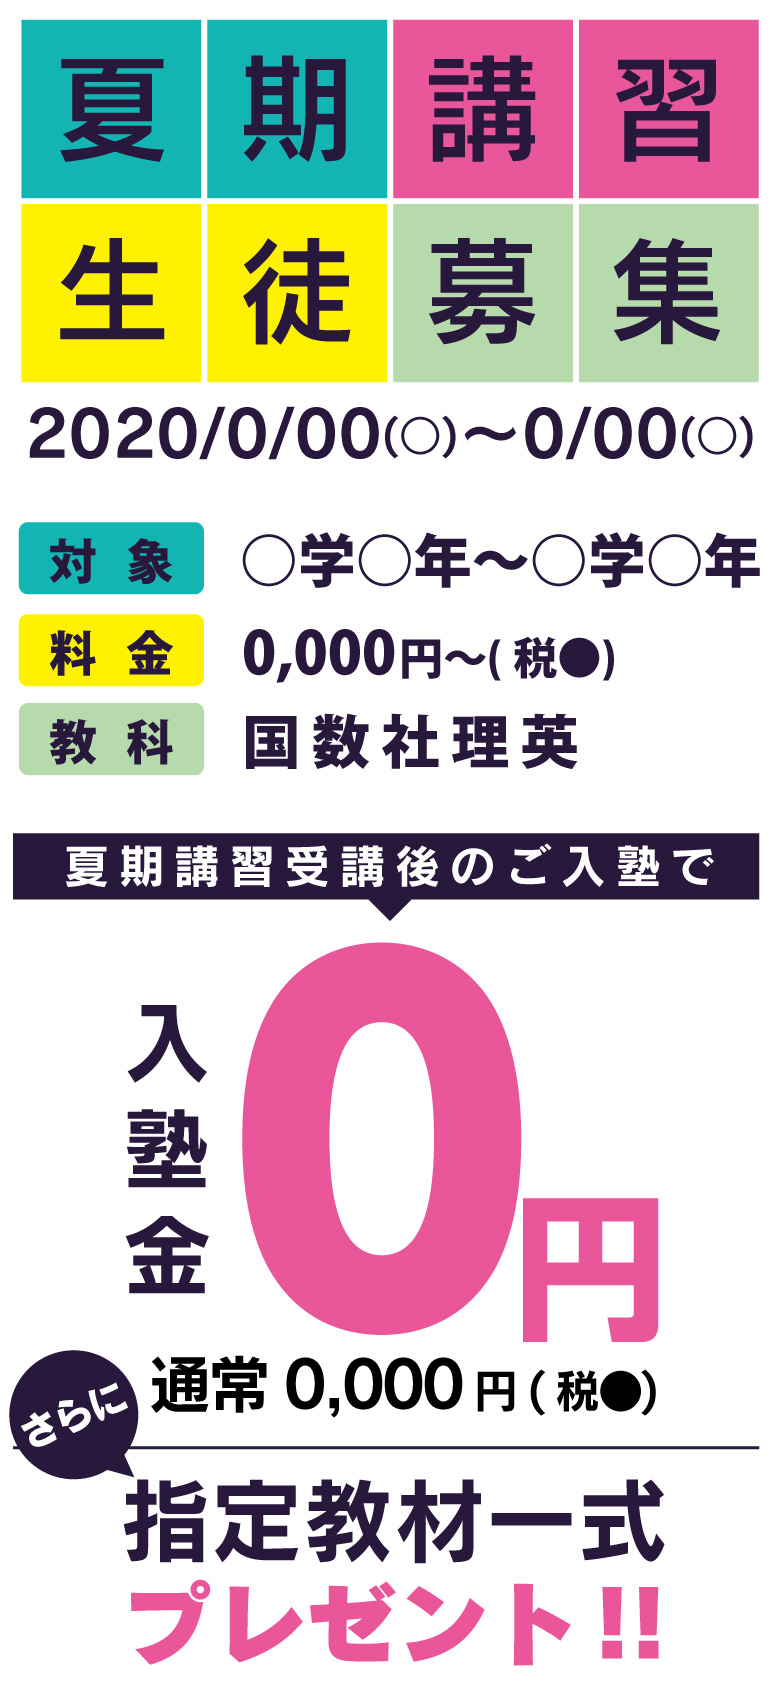 kds-case-20n-a-07